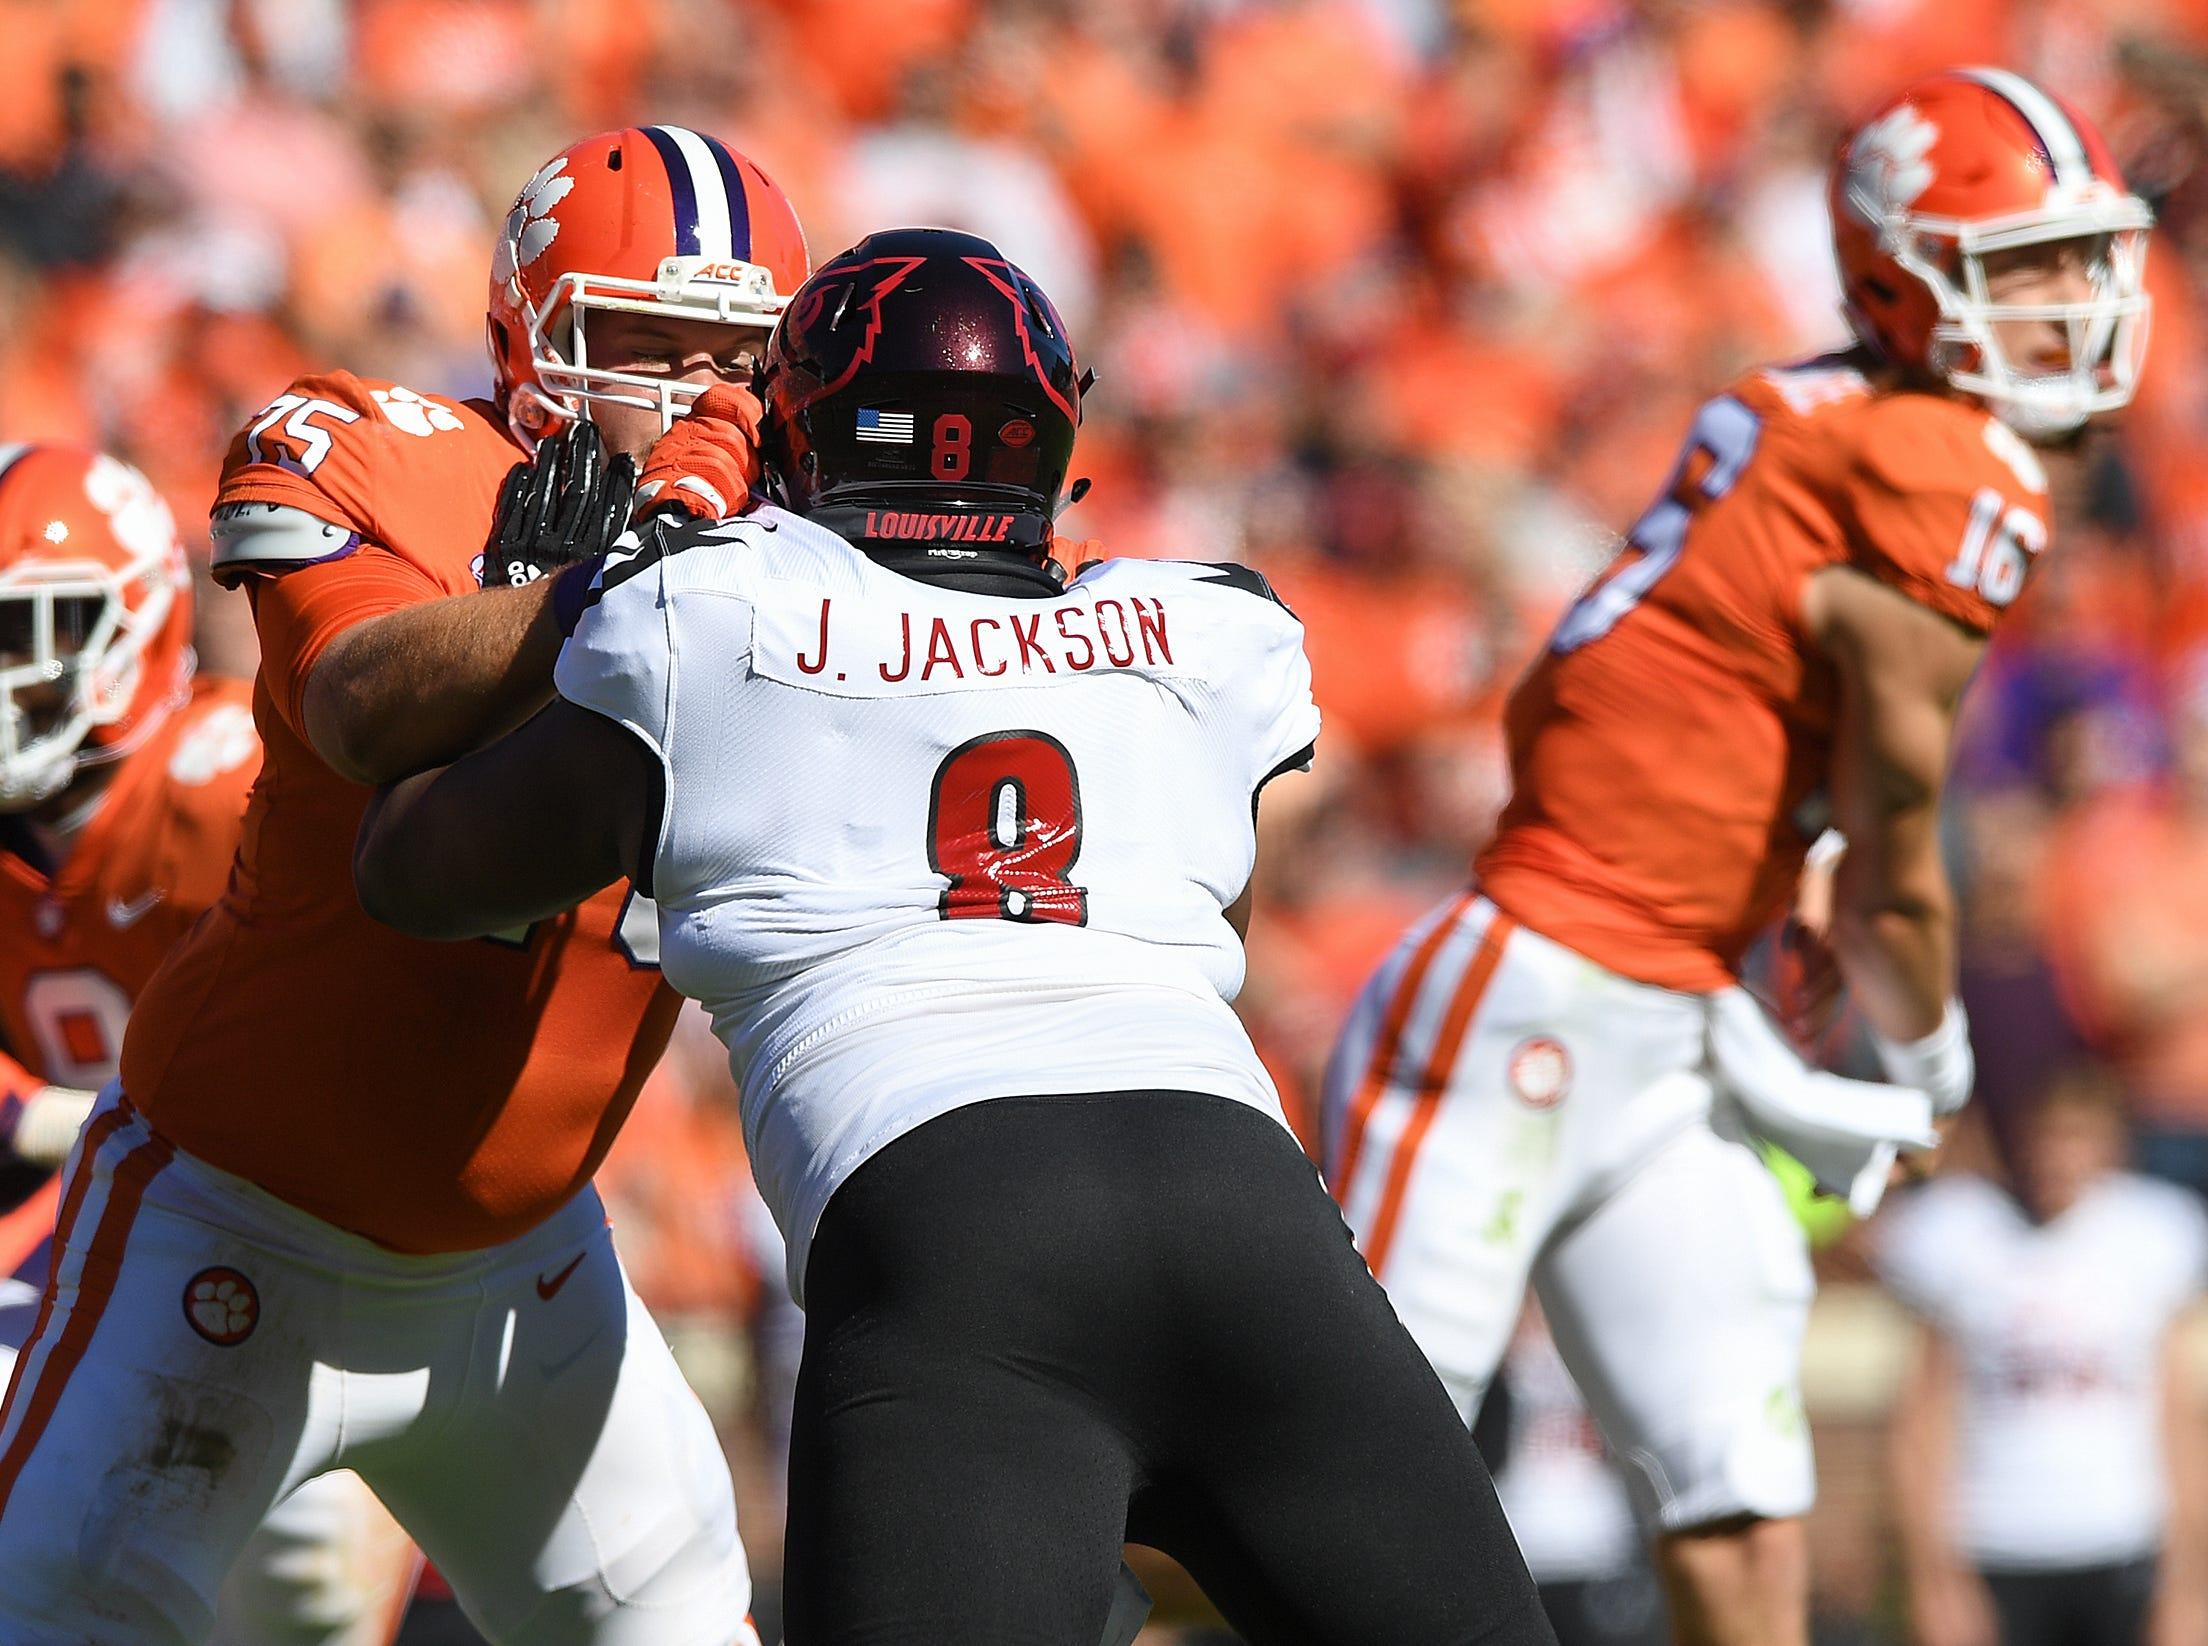 Clemson offensive lineman Mitch Hyatt (75) blocks Louisville defensive end Jarrett Jackson (8) during the 1st quarter Saturday, November 3, 2018 at Clemson's Memorial Stadium.